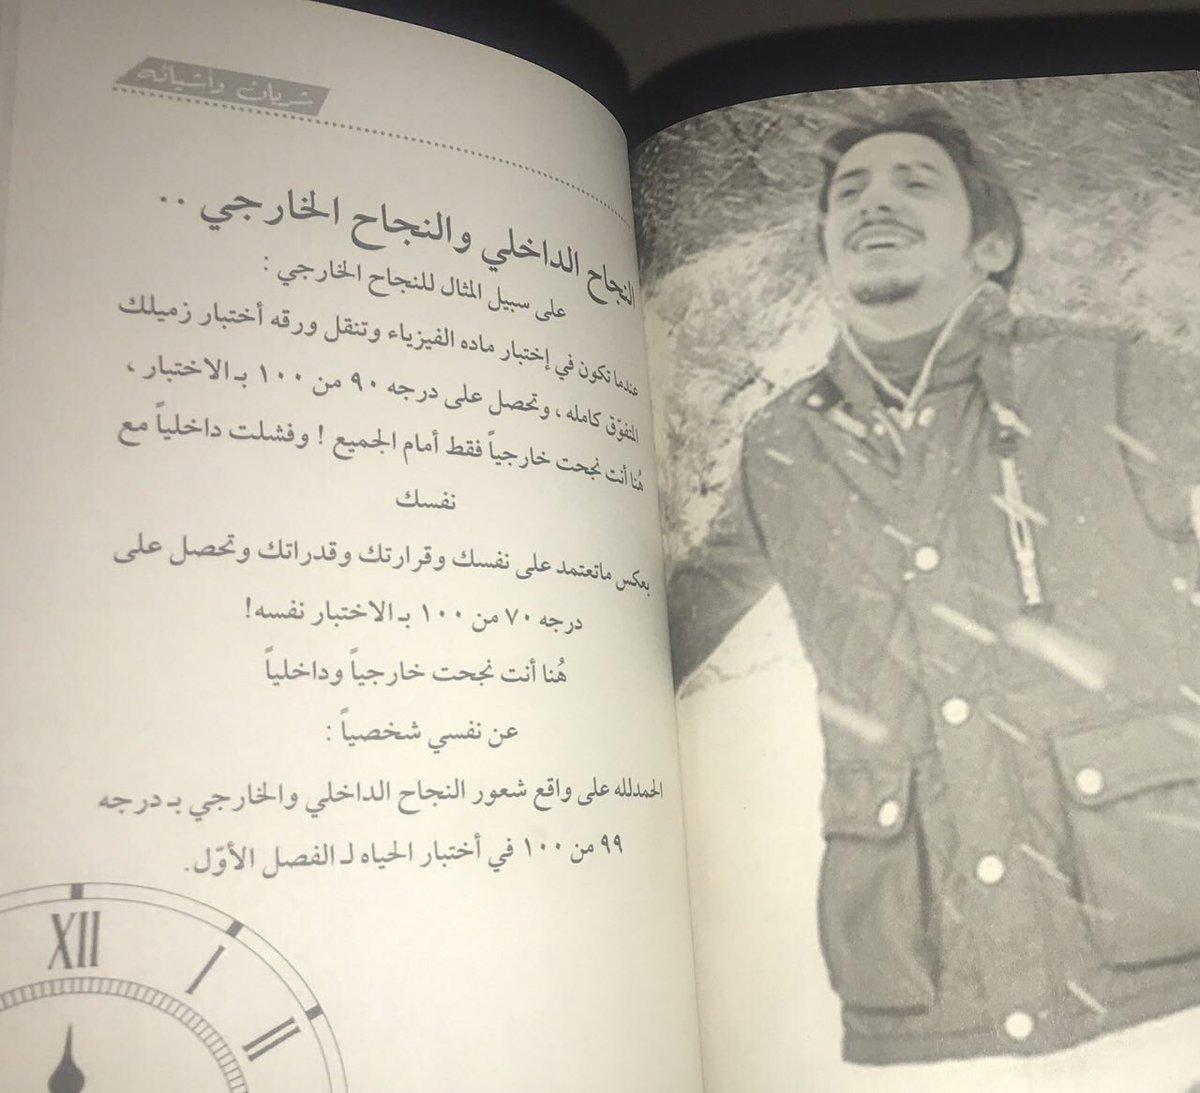 تحميل كتاب شريان الديحاني pdf